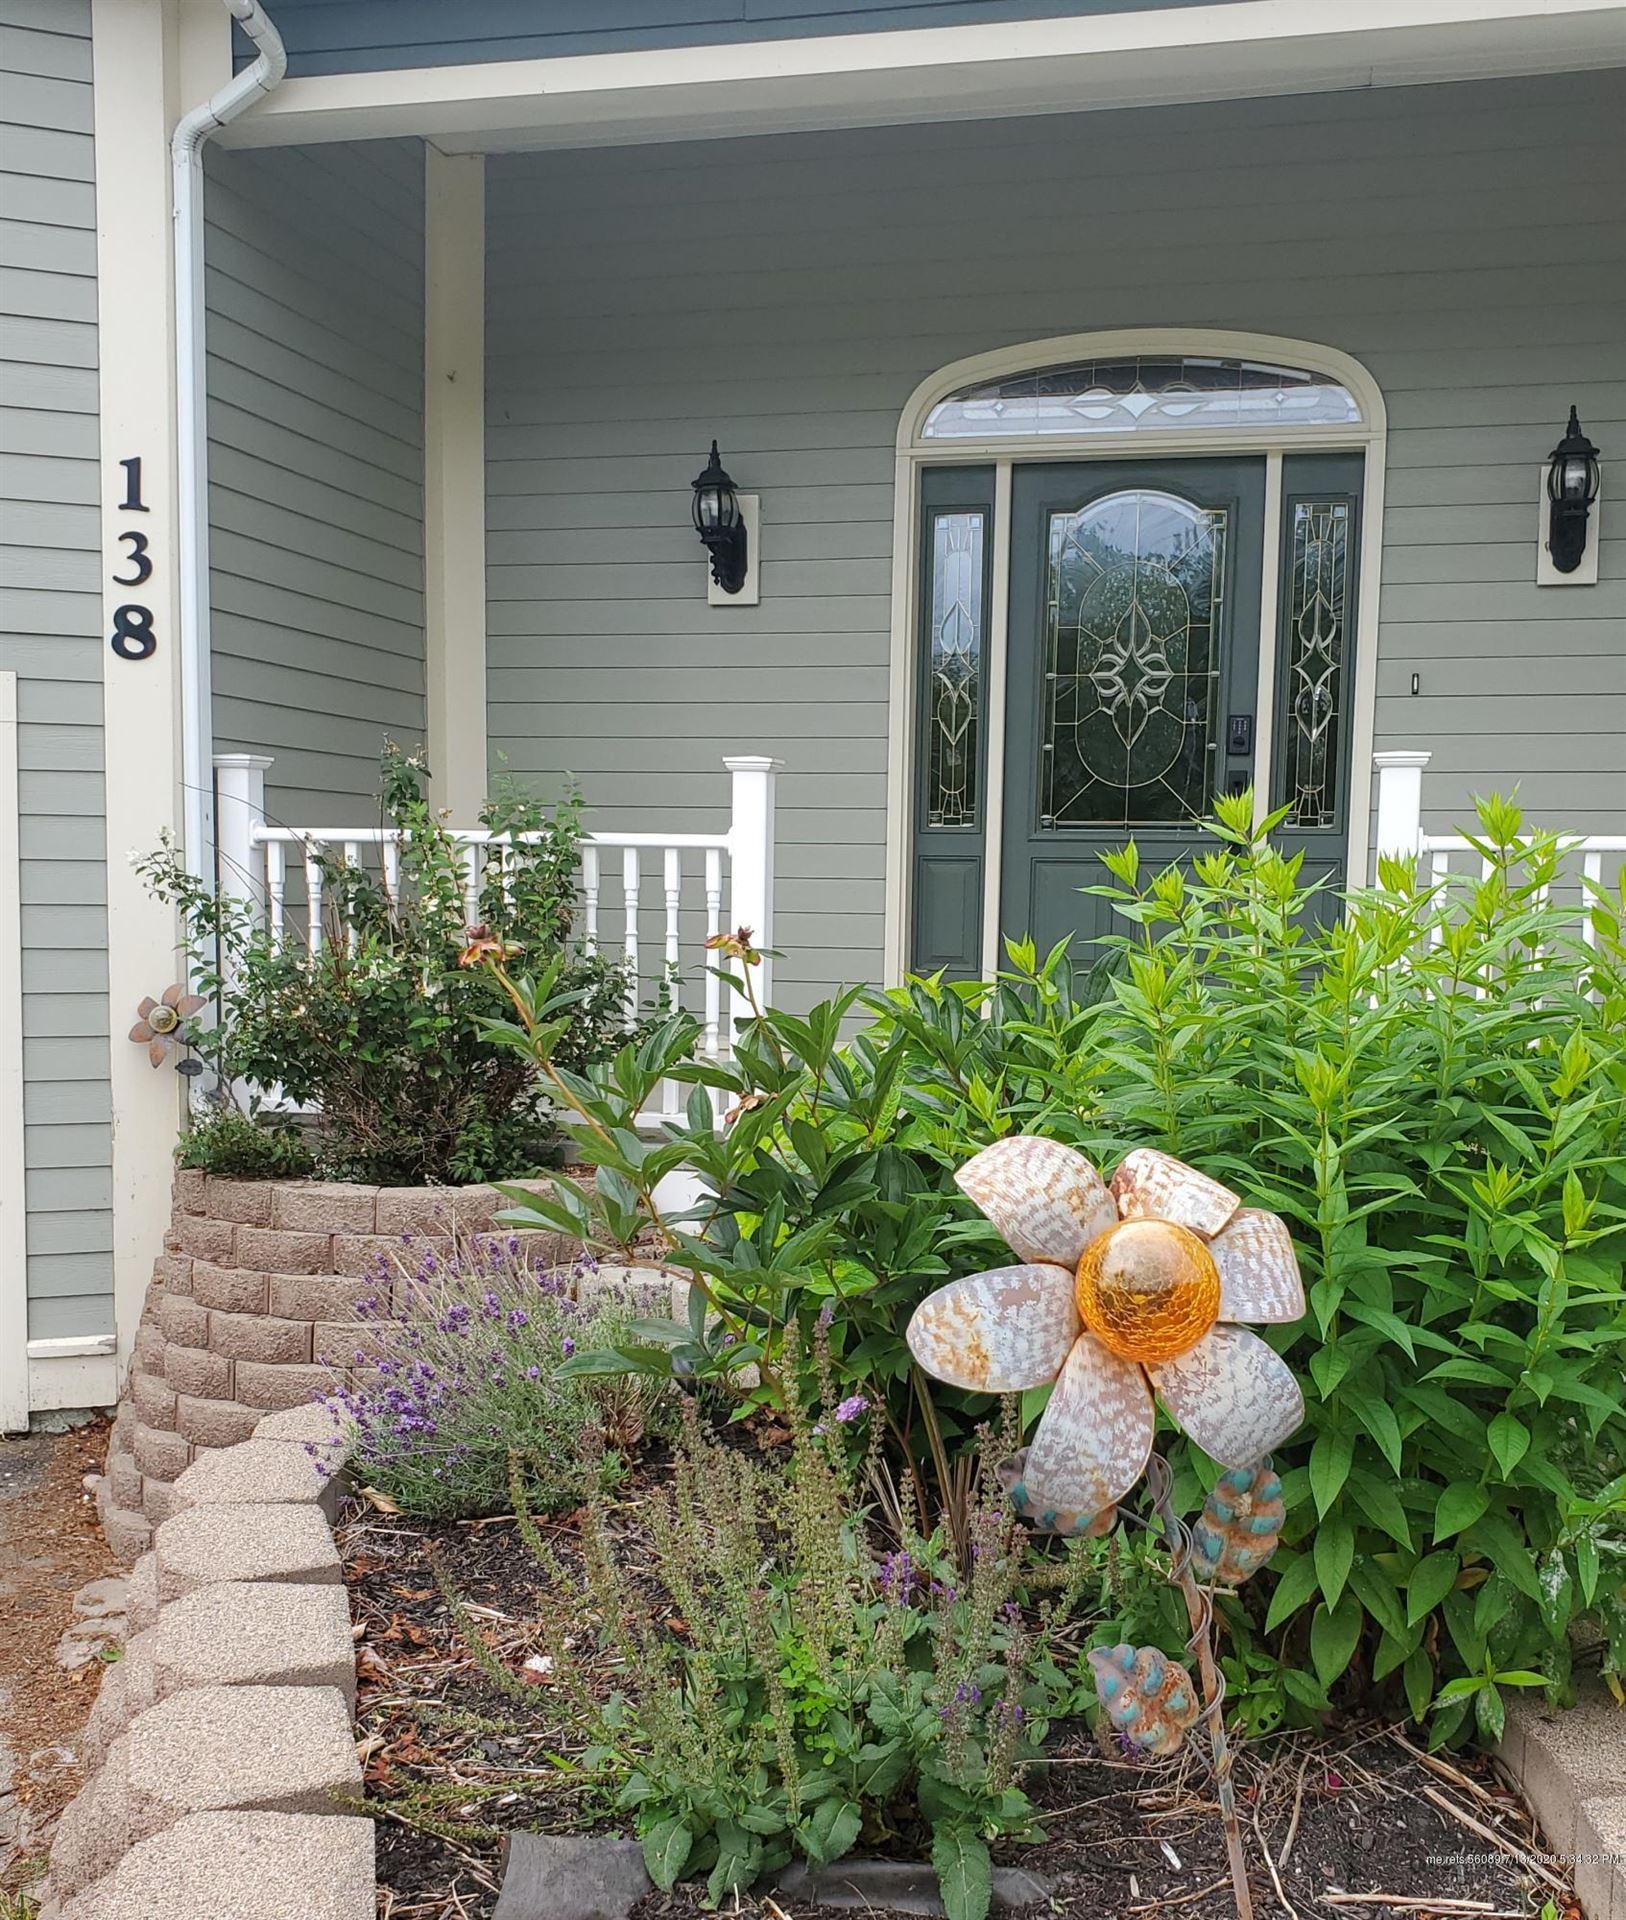 Photo of 138 Glen View Road, Skowhegan, ME 04976 (MLS # 1460022)